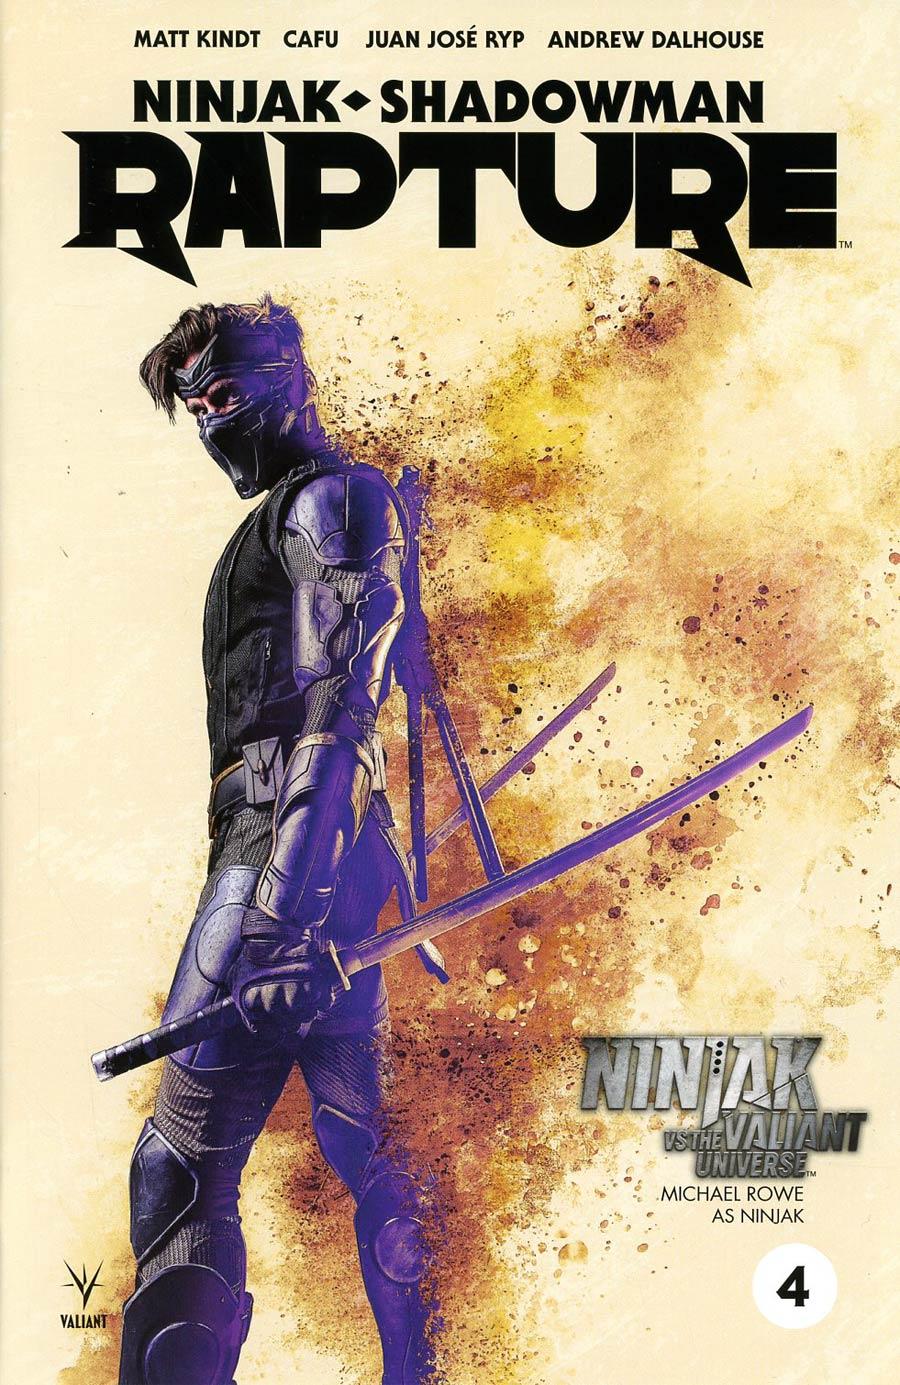 Rapture (Valiant Entertainment) #4 Cover C Variant Ninjak vs The Valiant Universe Cover